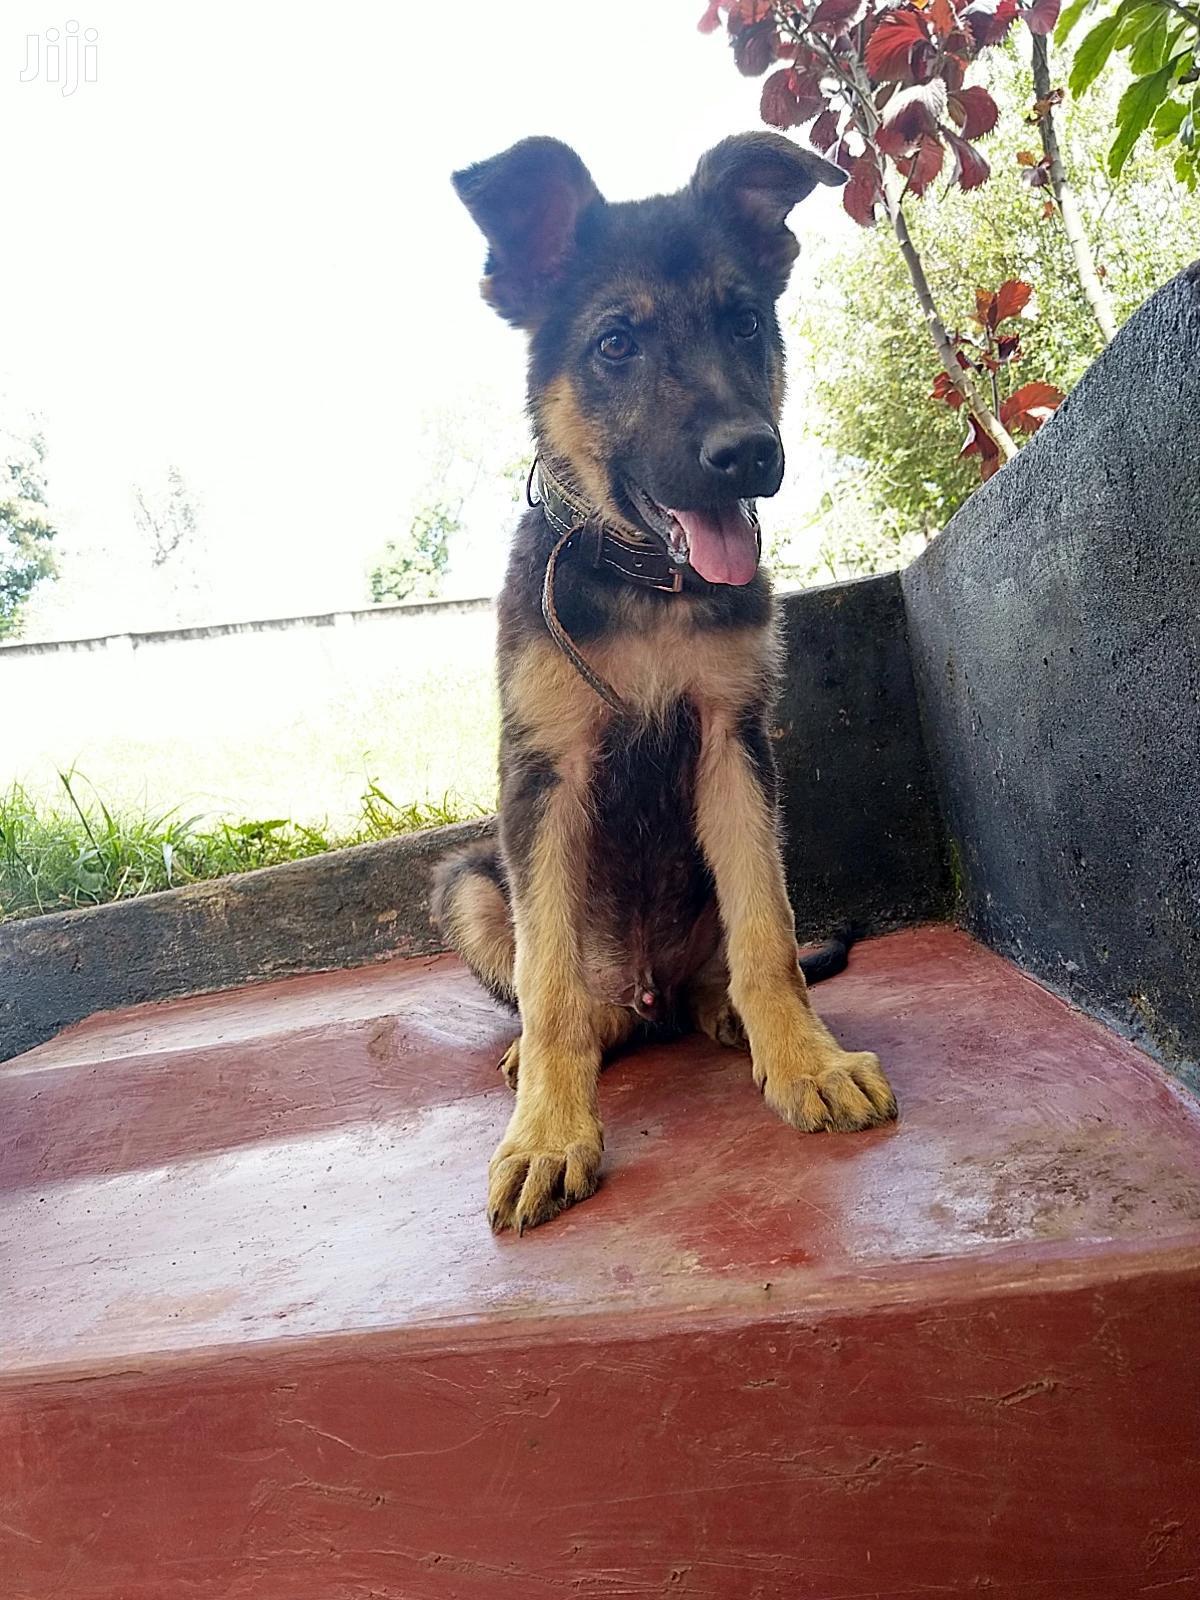 3-6 month Male Purebred German Shepherd